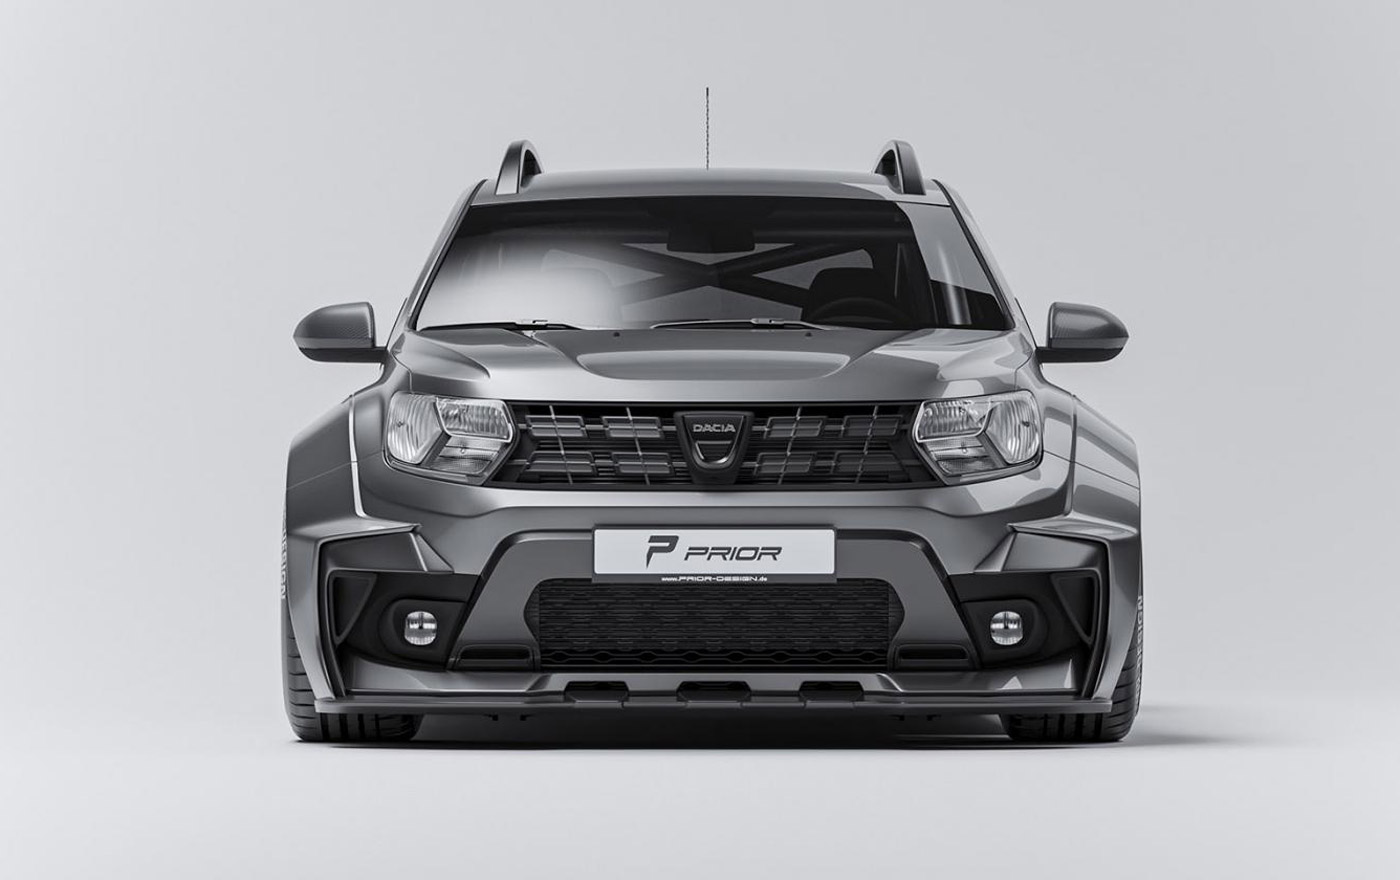 Dacia-Duster-bodykit-by-Prior-Design-3